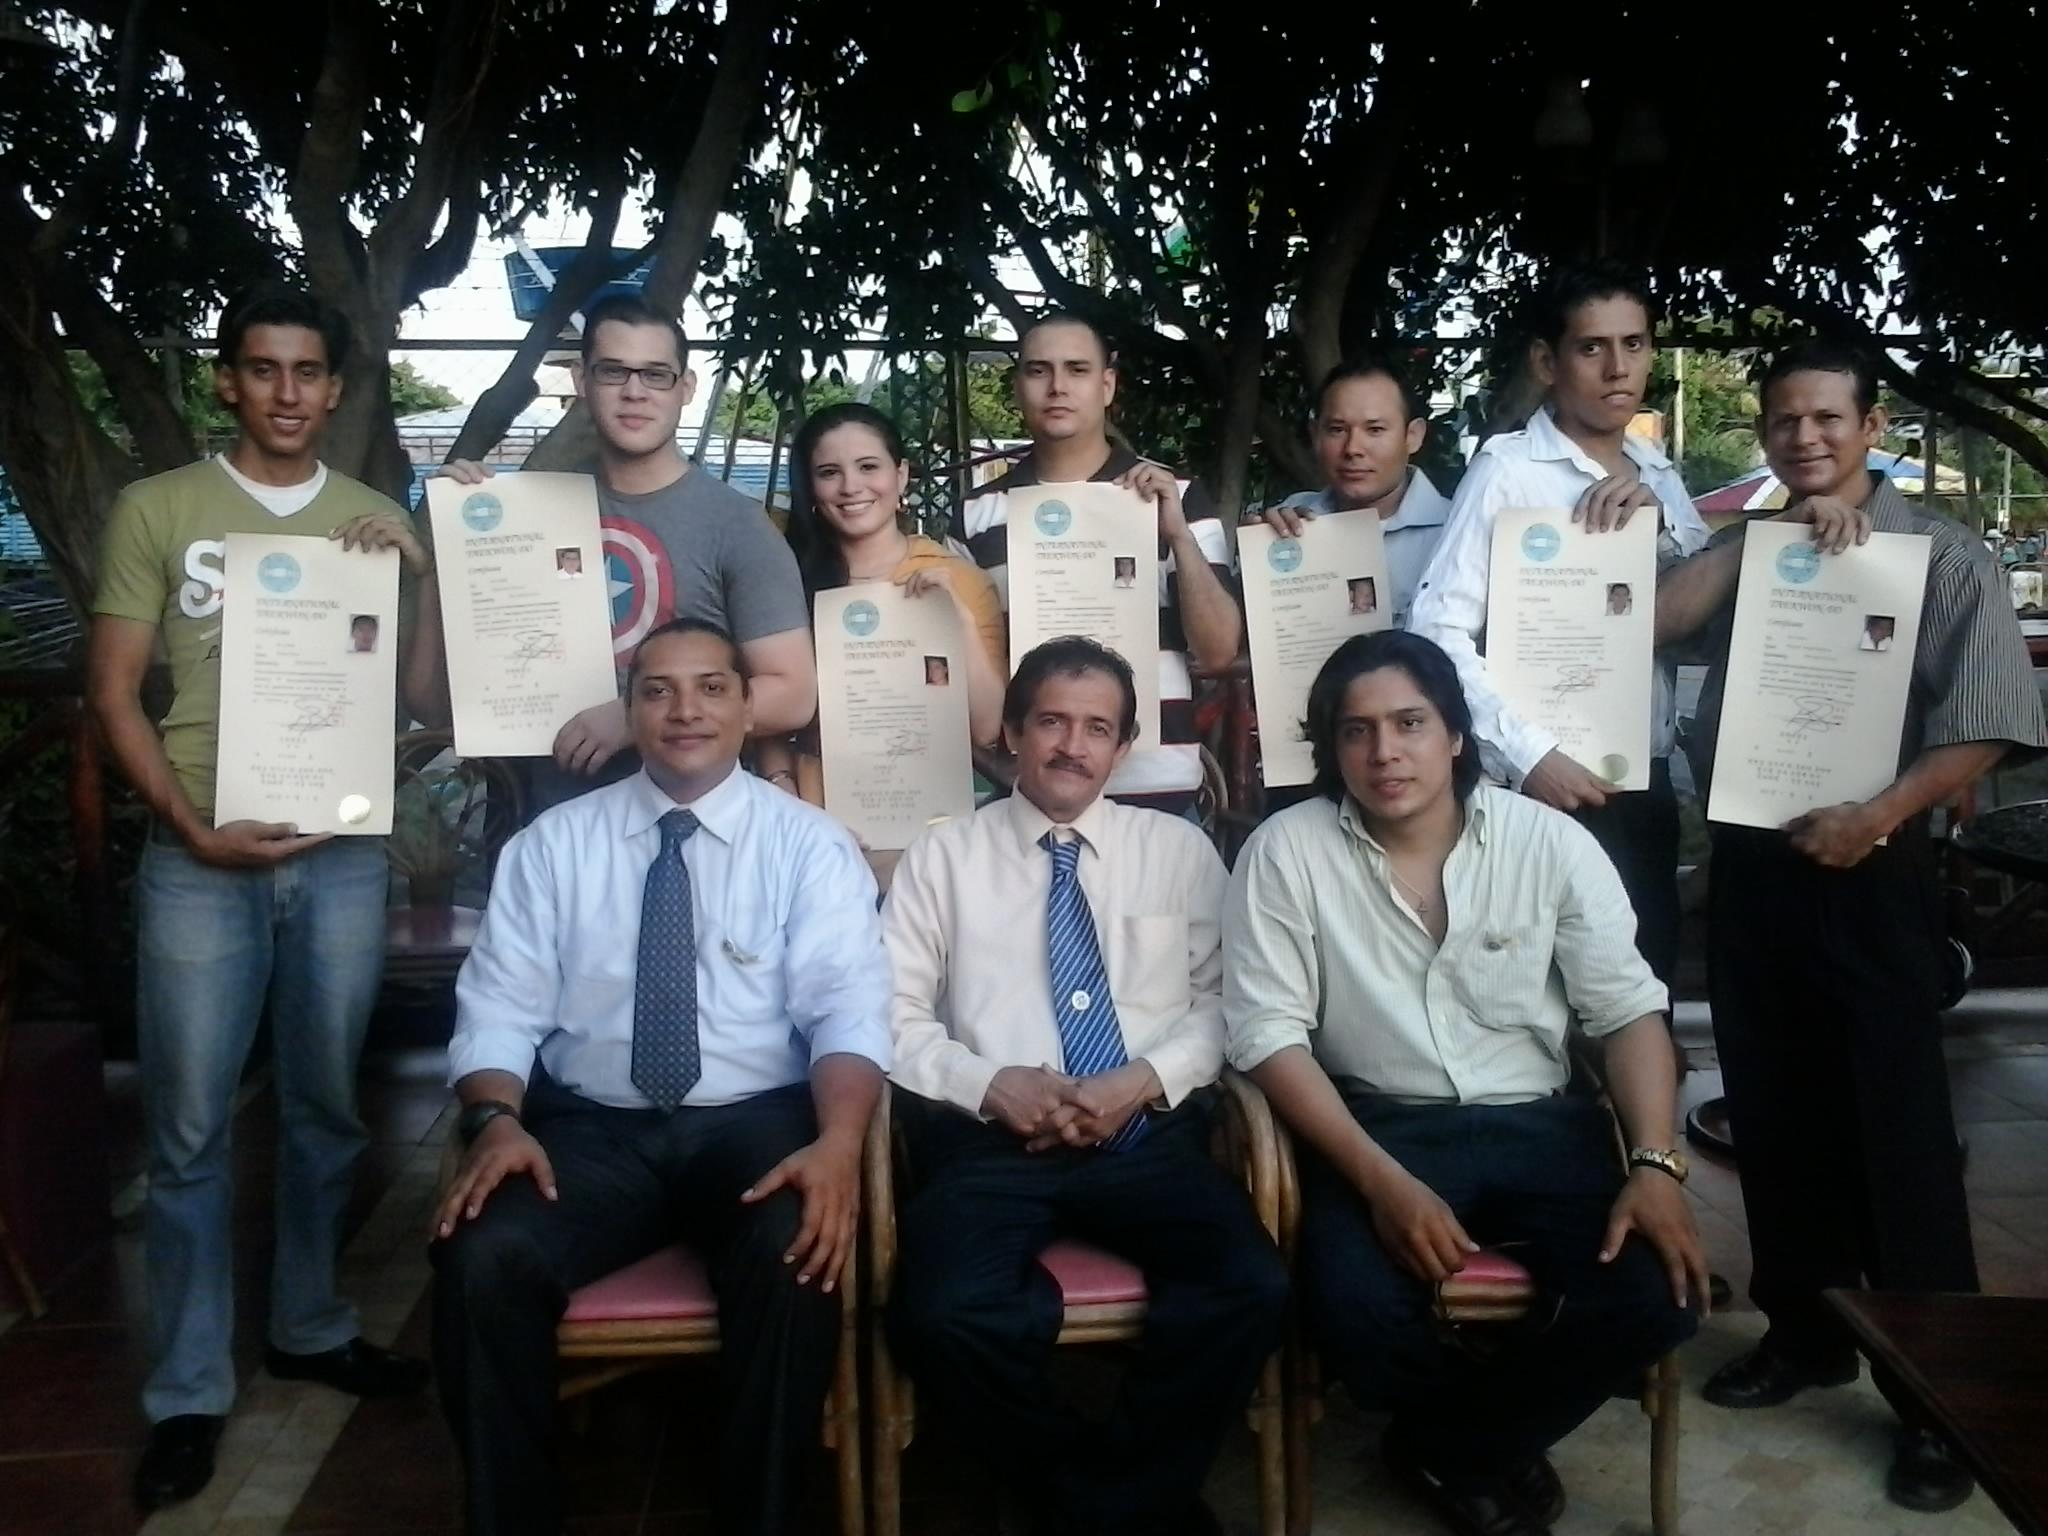 2013-11-16 - Certificate Ceremony